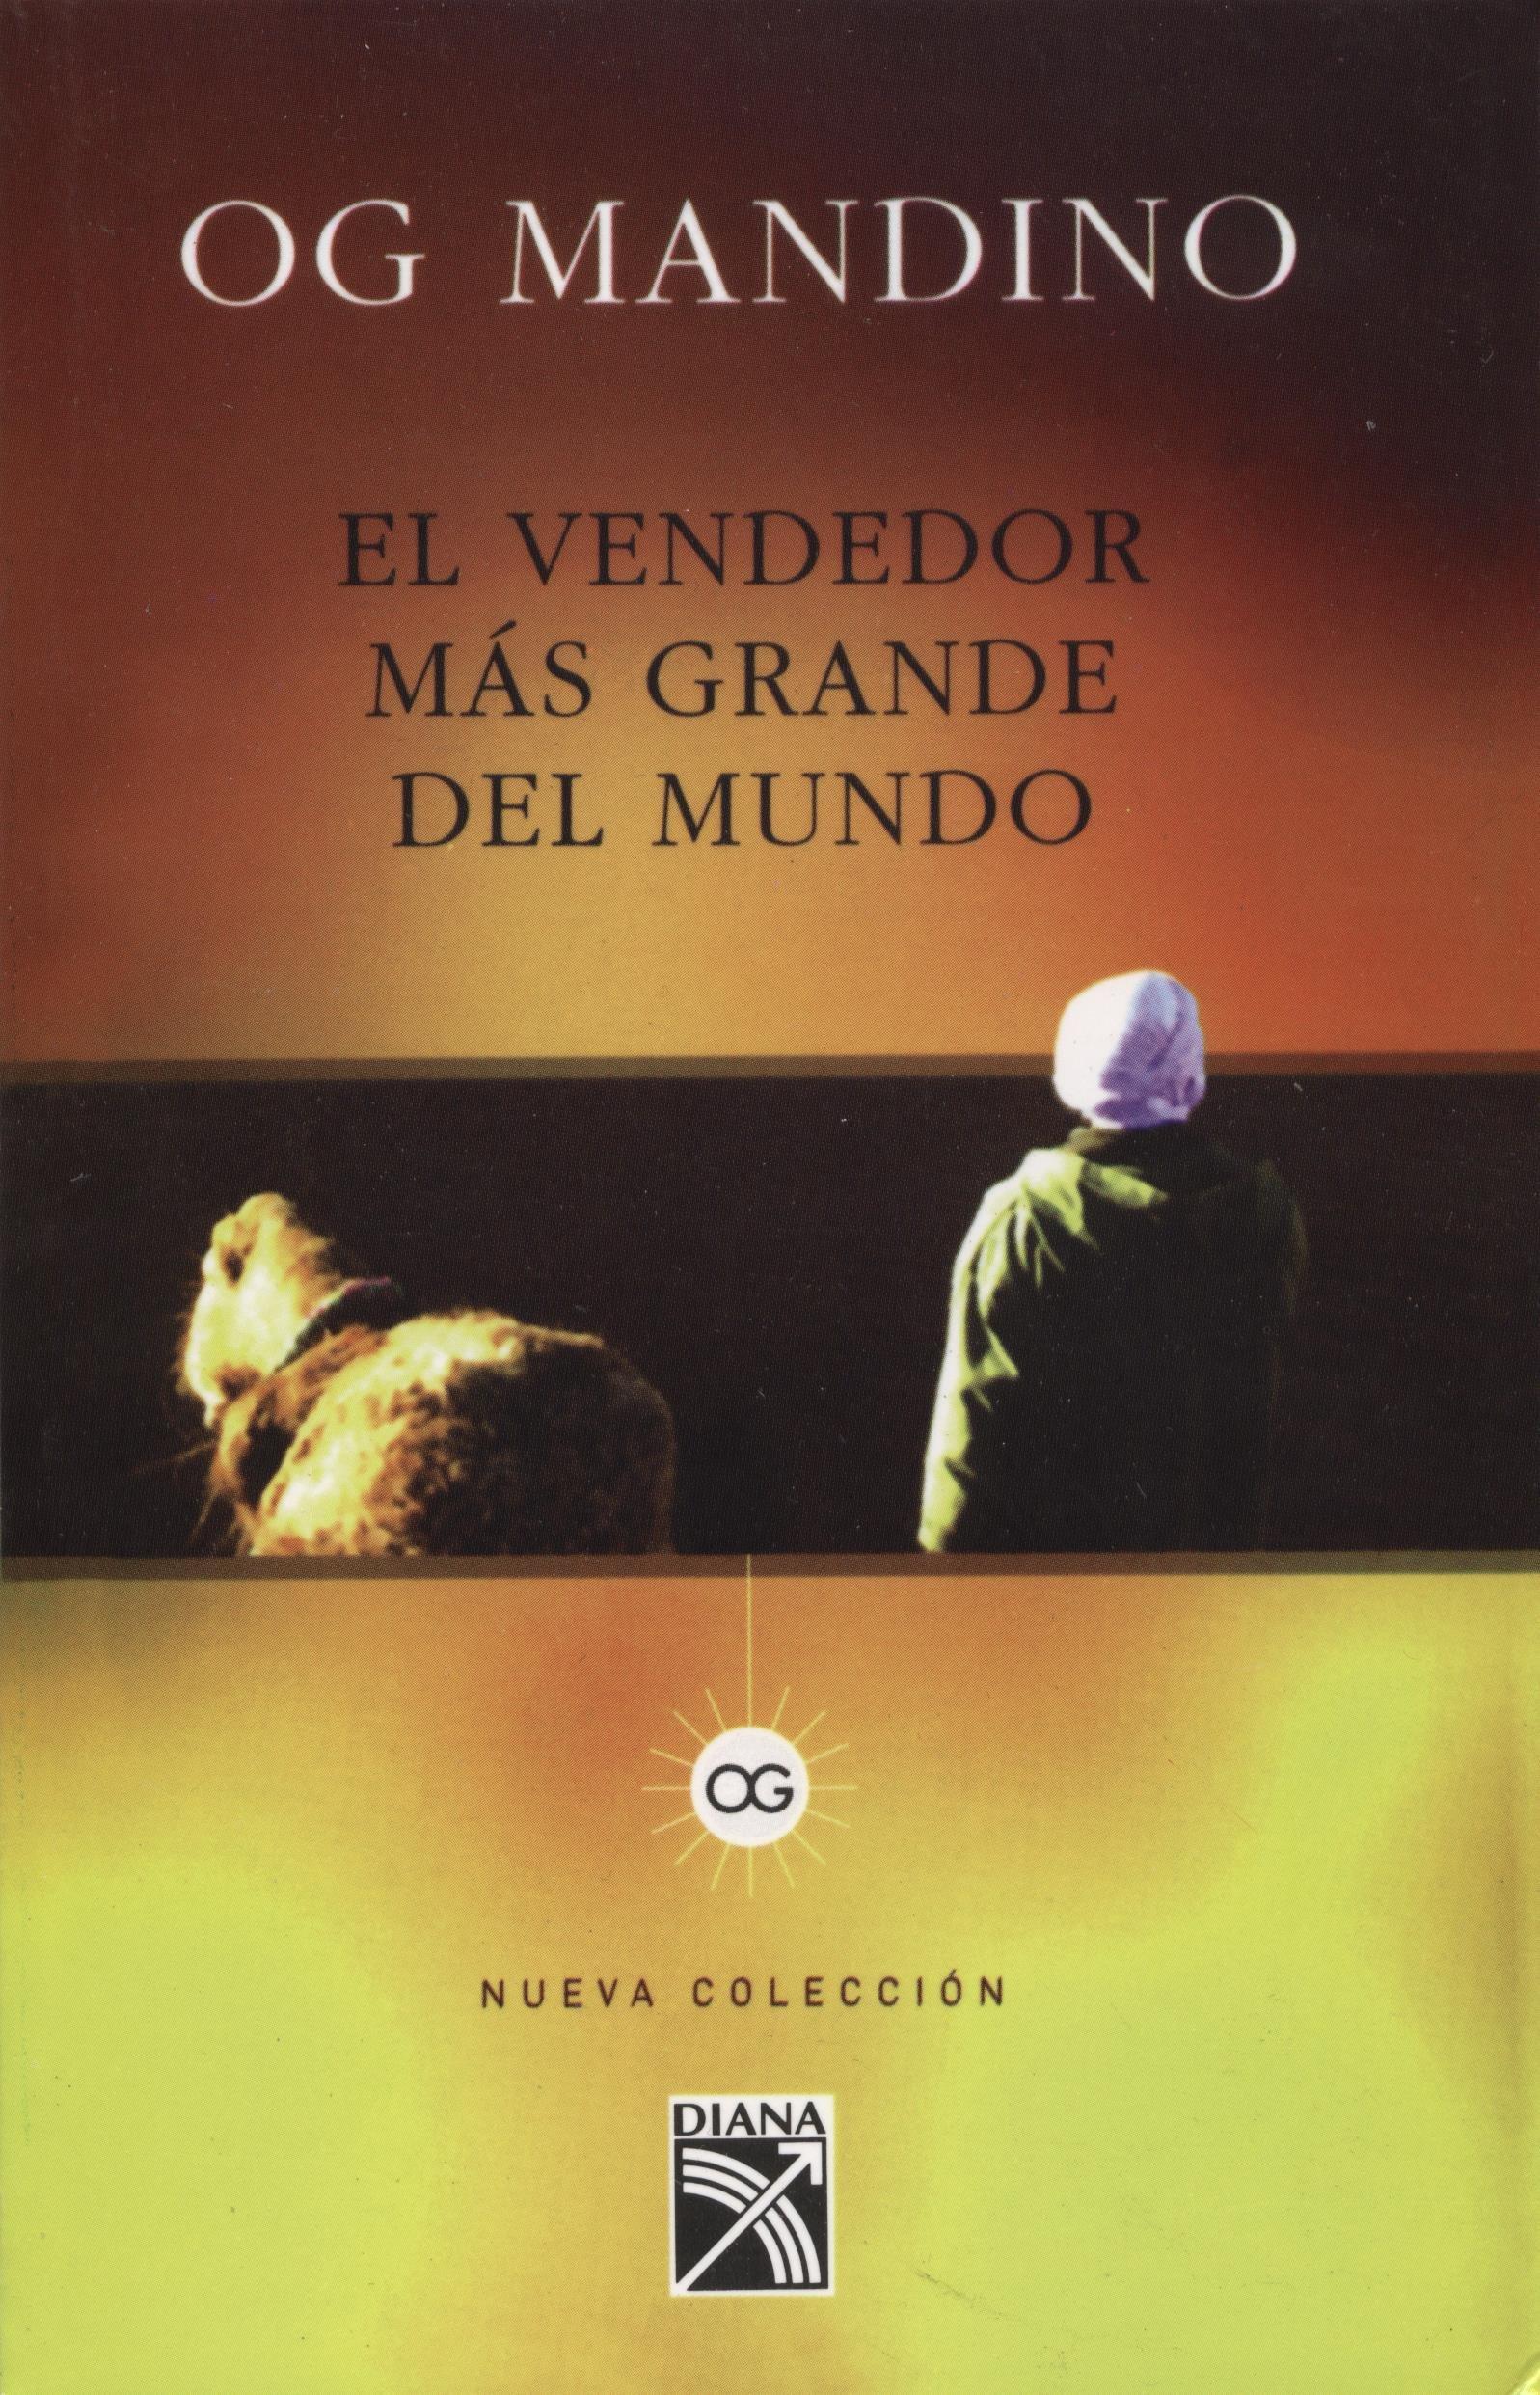 Vendedor mas grande del mundo, El (Nueva Coleccion) (Spanish Edition): Og  Mandino: 9789681343217: Amazon.com: Books